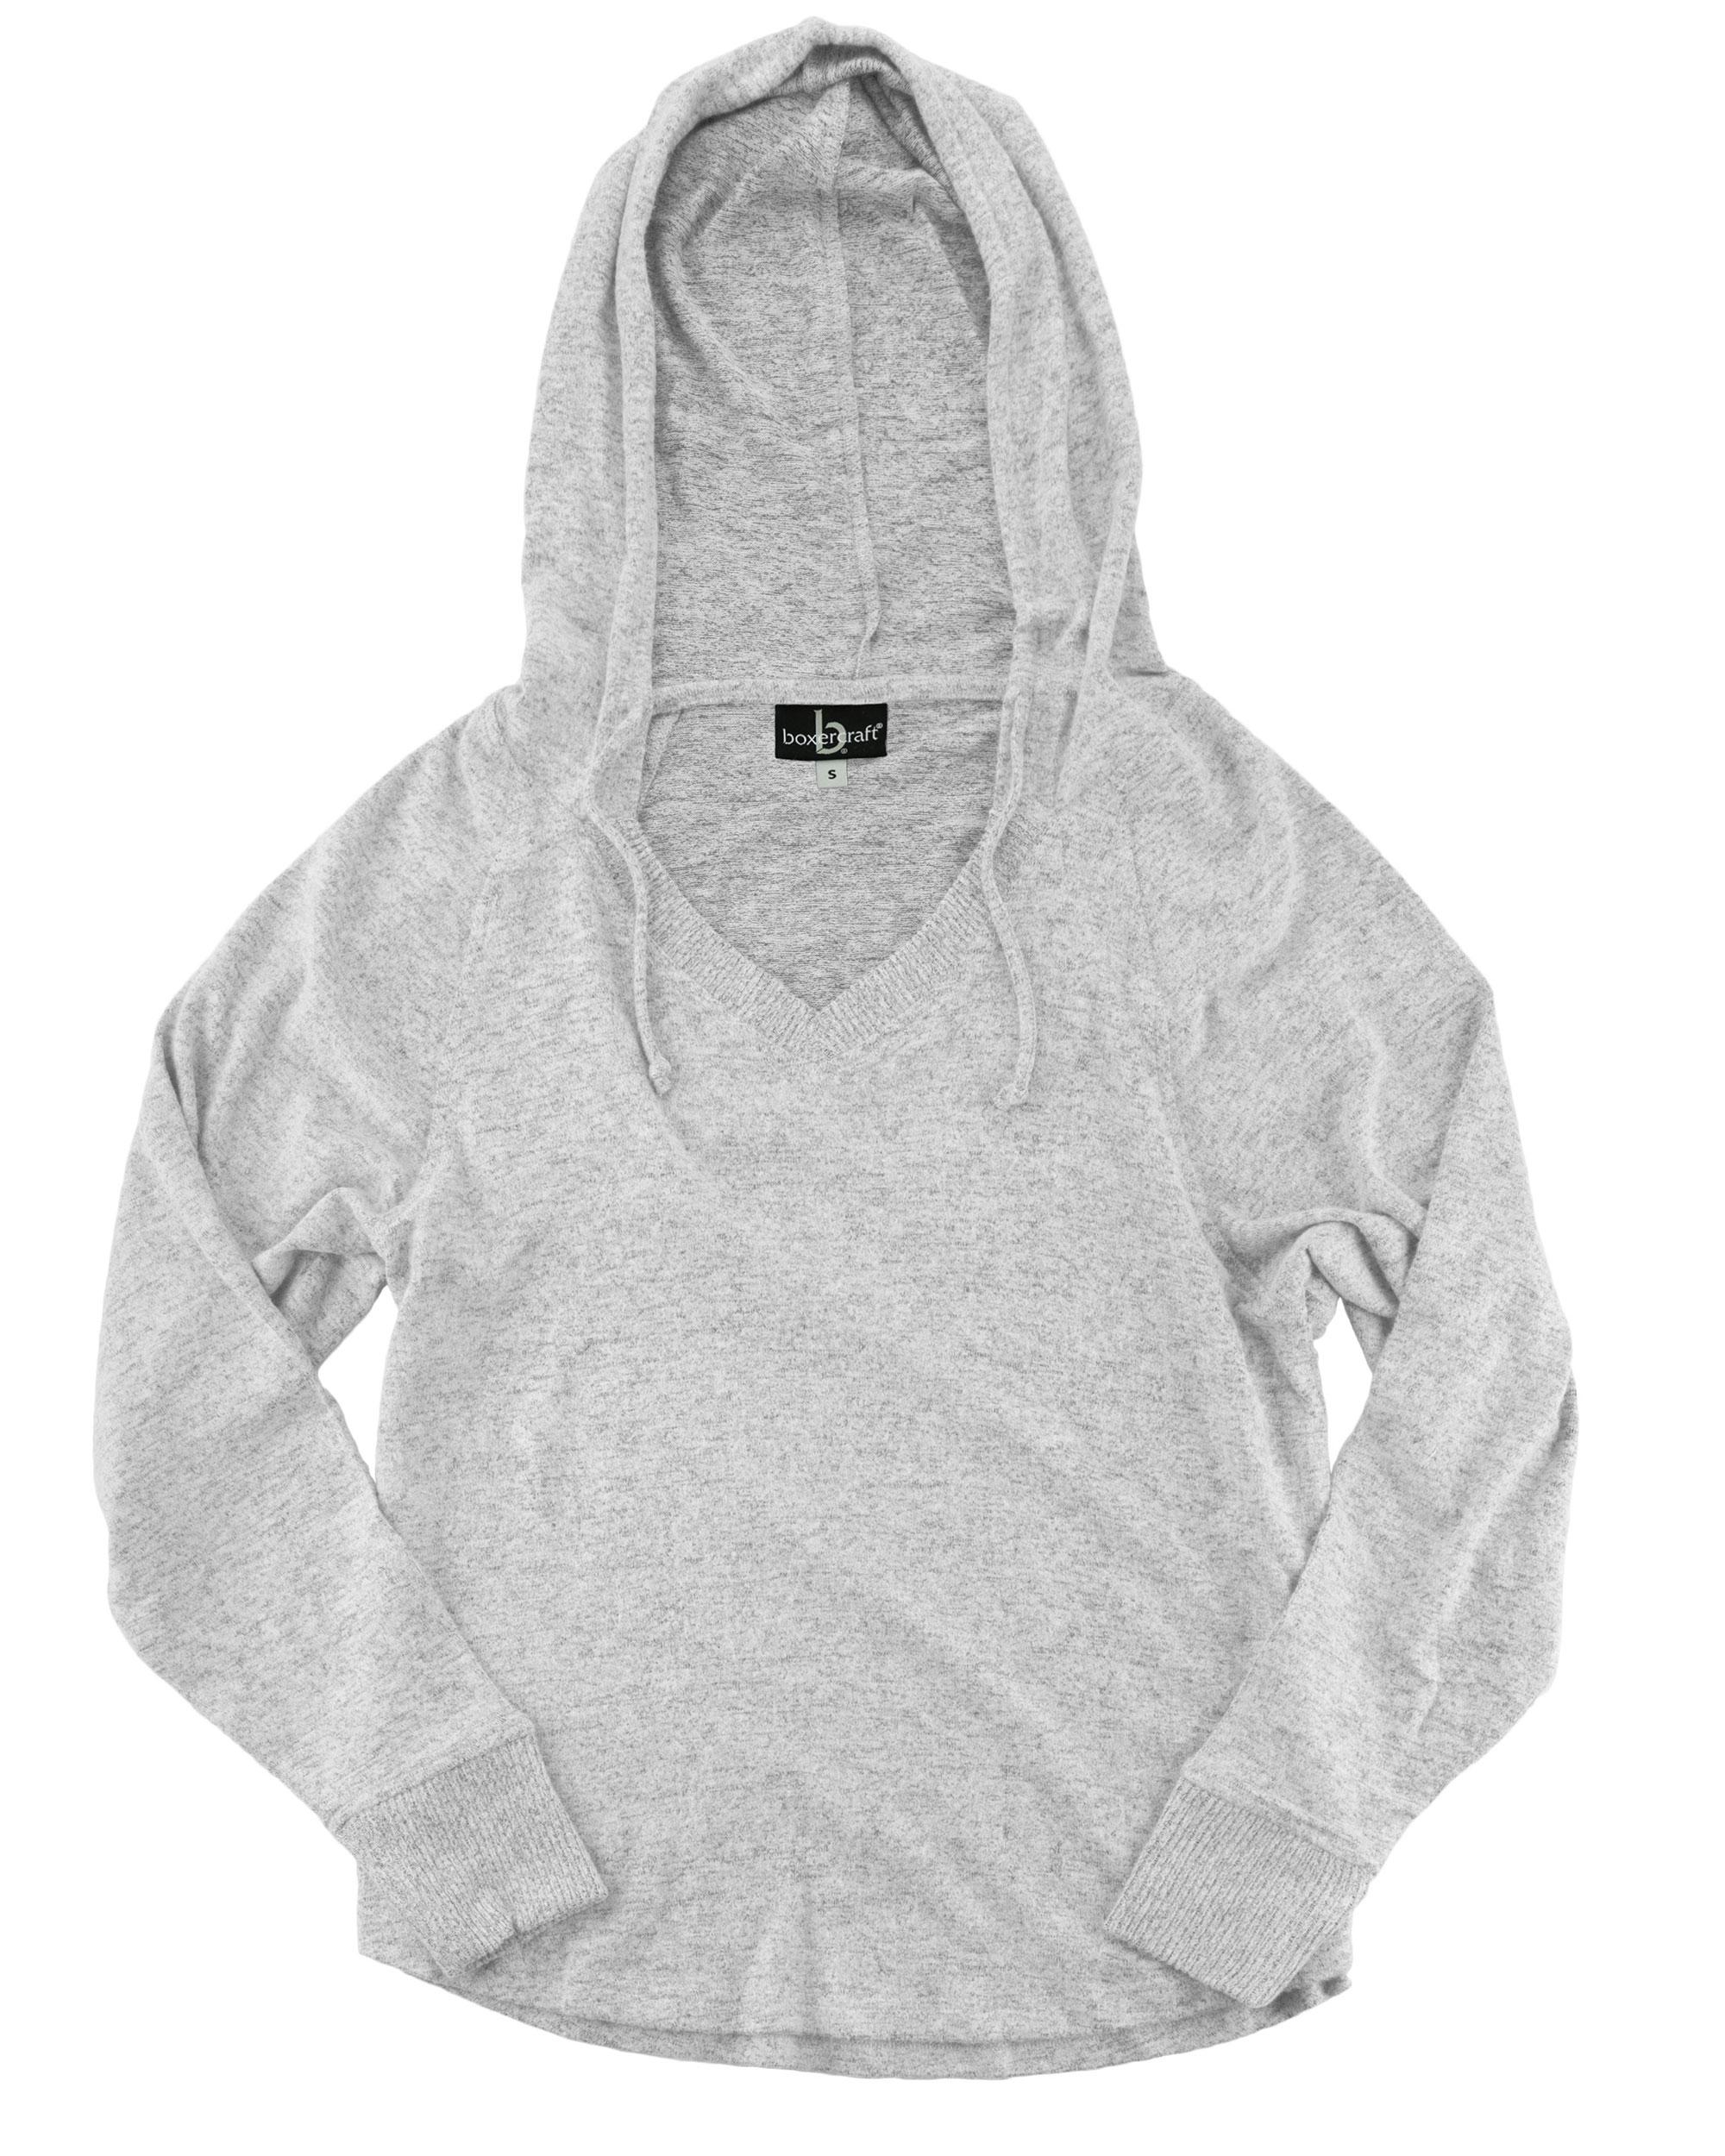 Boxercraft L07 - Women's Cuddle Fleece V-Neck Hooded ...